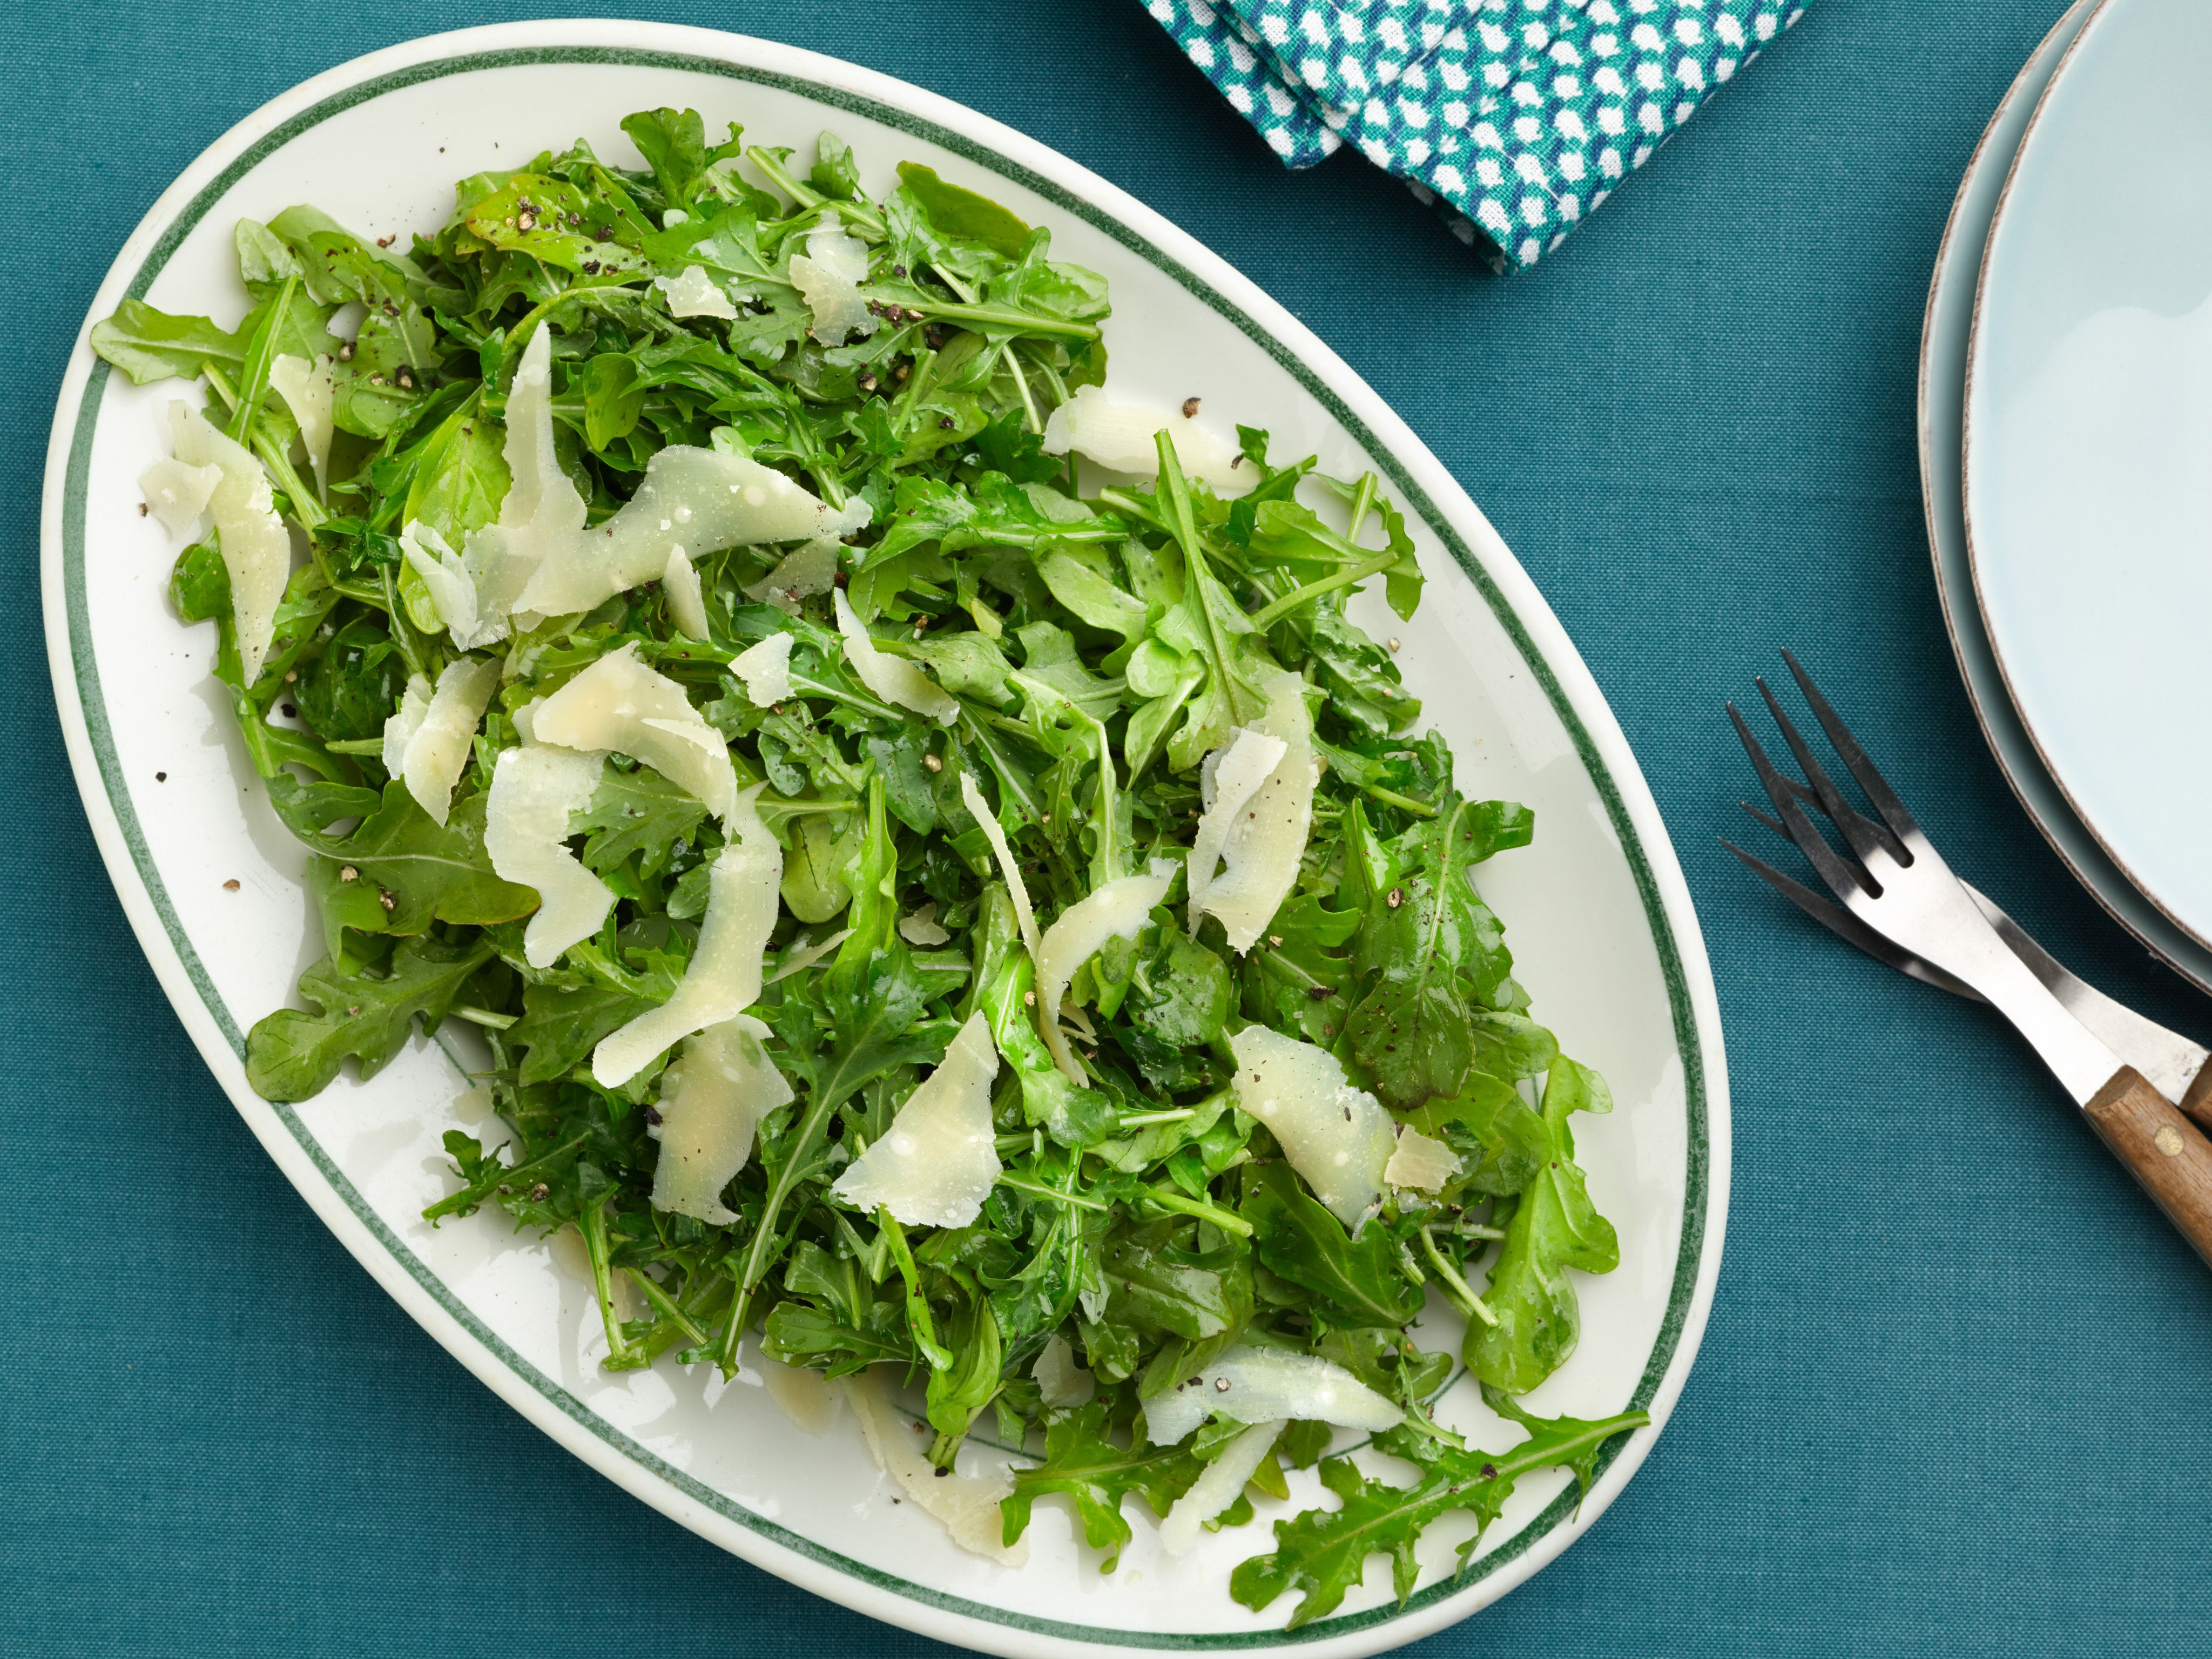 Arugula Salad With Olive Oil Lemon And Parmesan Cheese Recipe Arugula Salad Recipes Food Network Recipes Recipes With Parmesan Cheese